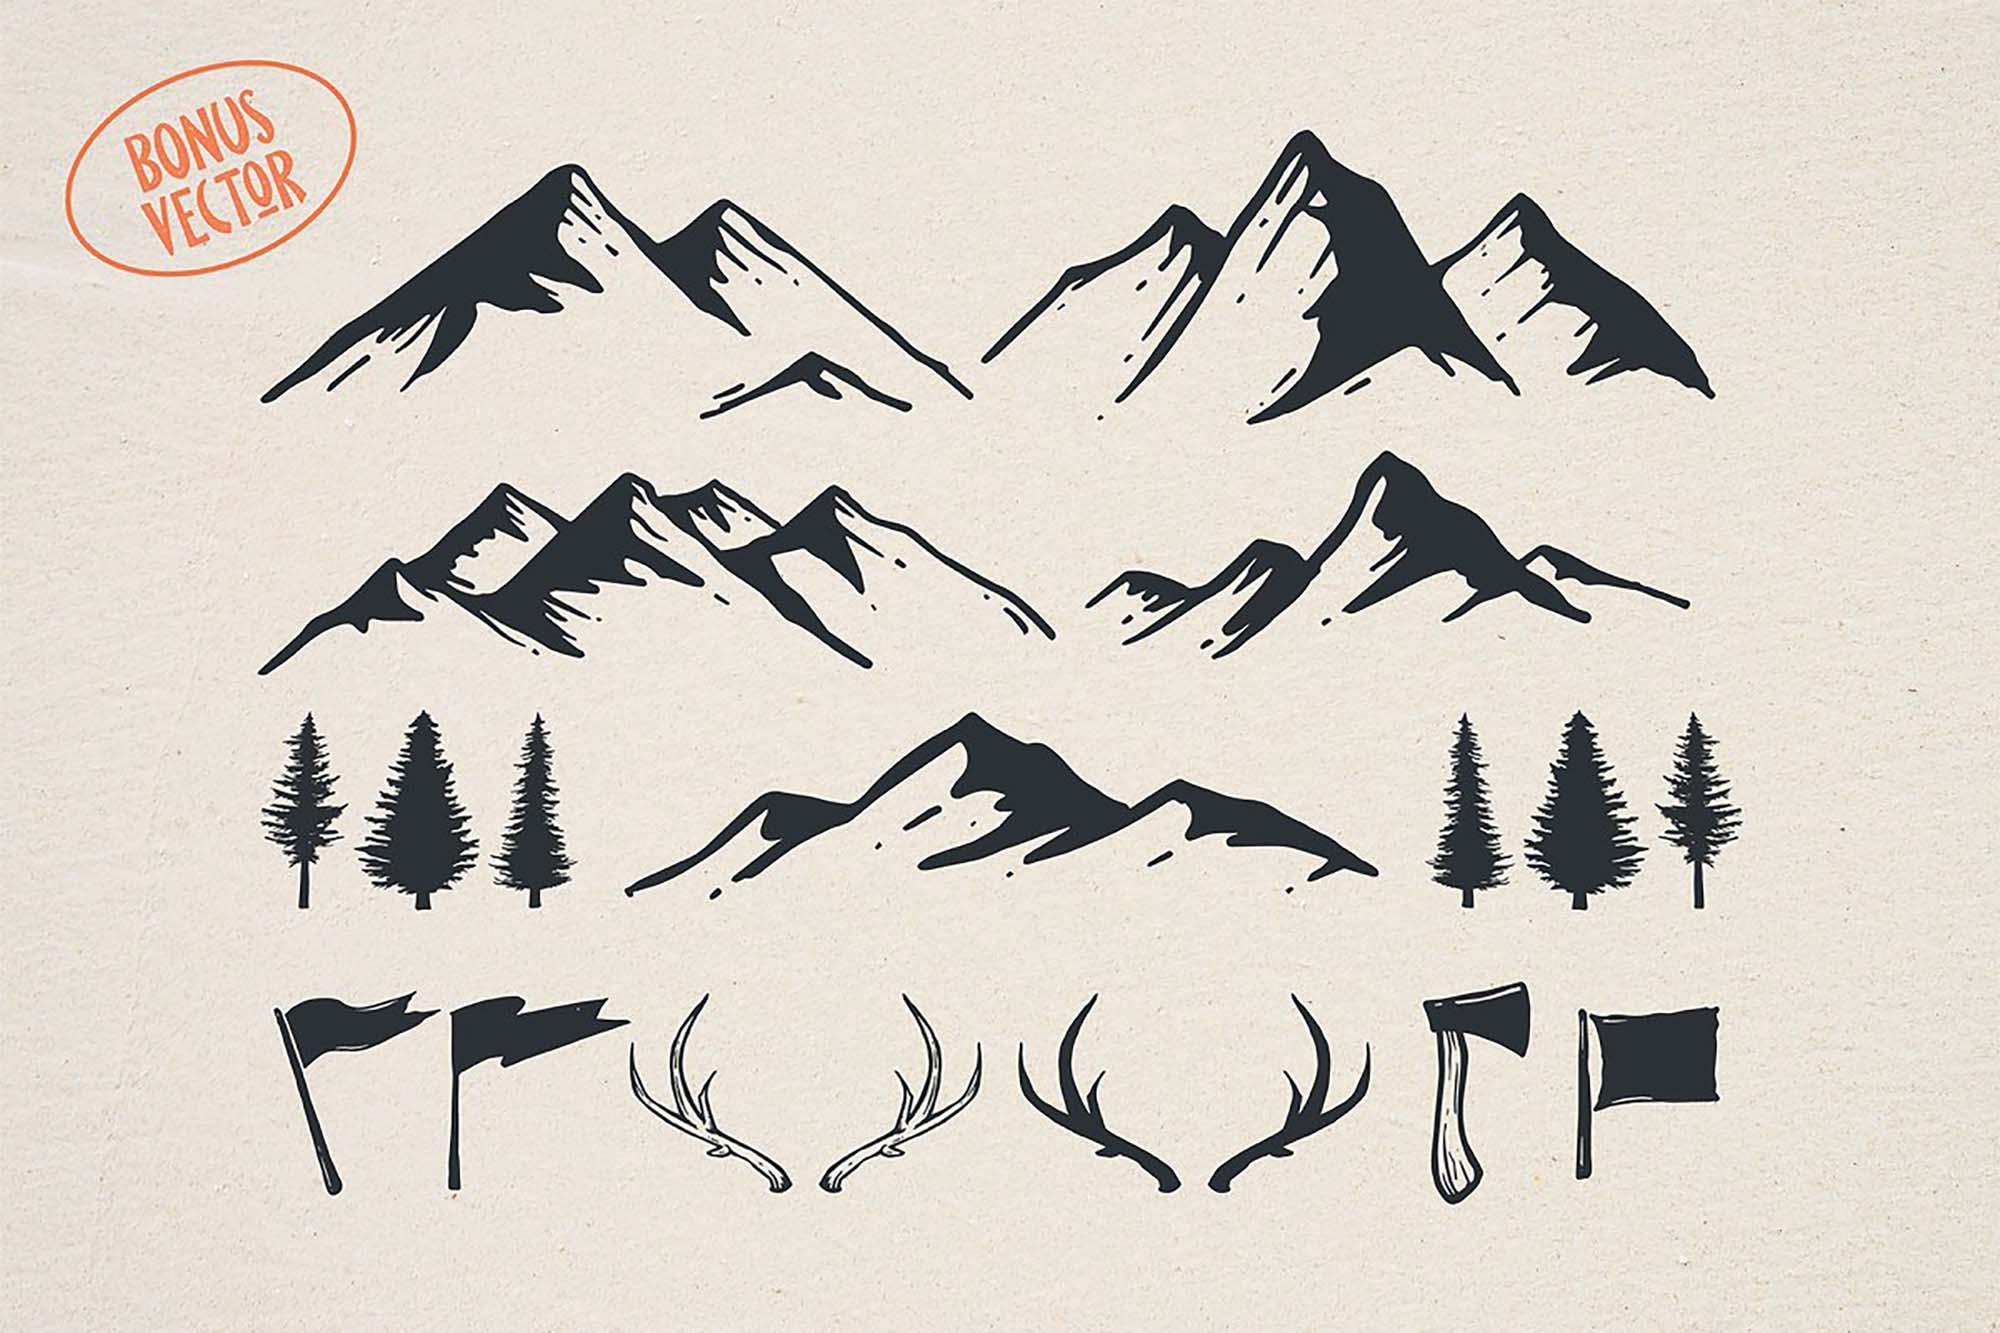 Pine Forest Outdoor Typeface - Vector Bonus